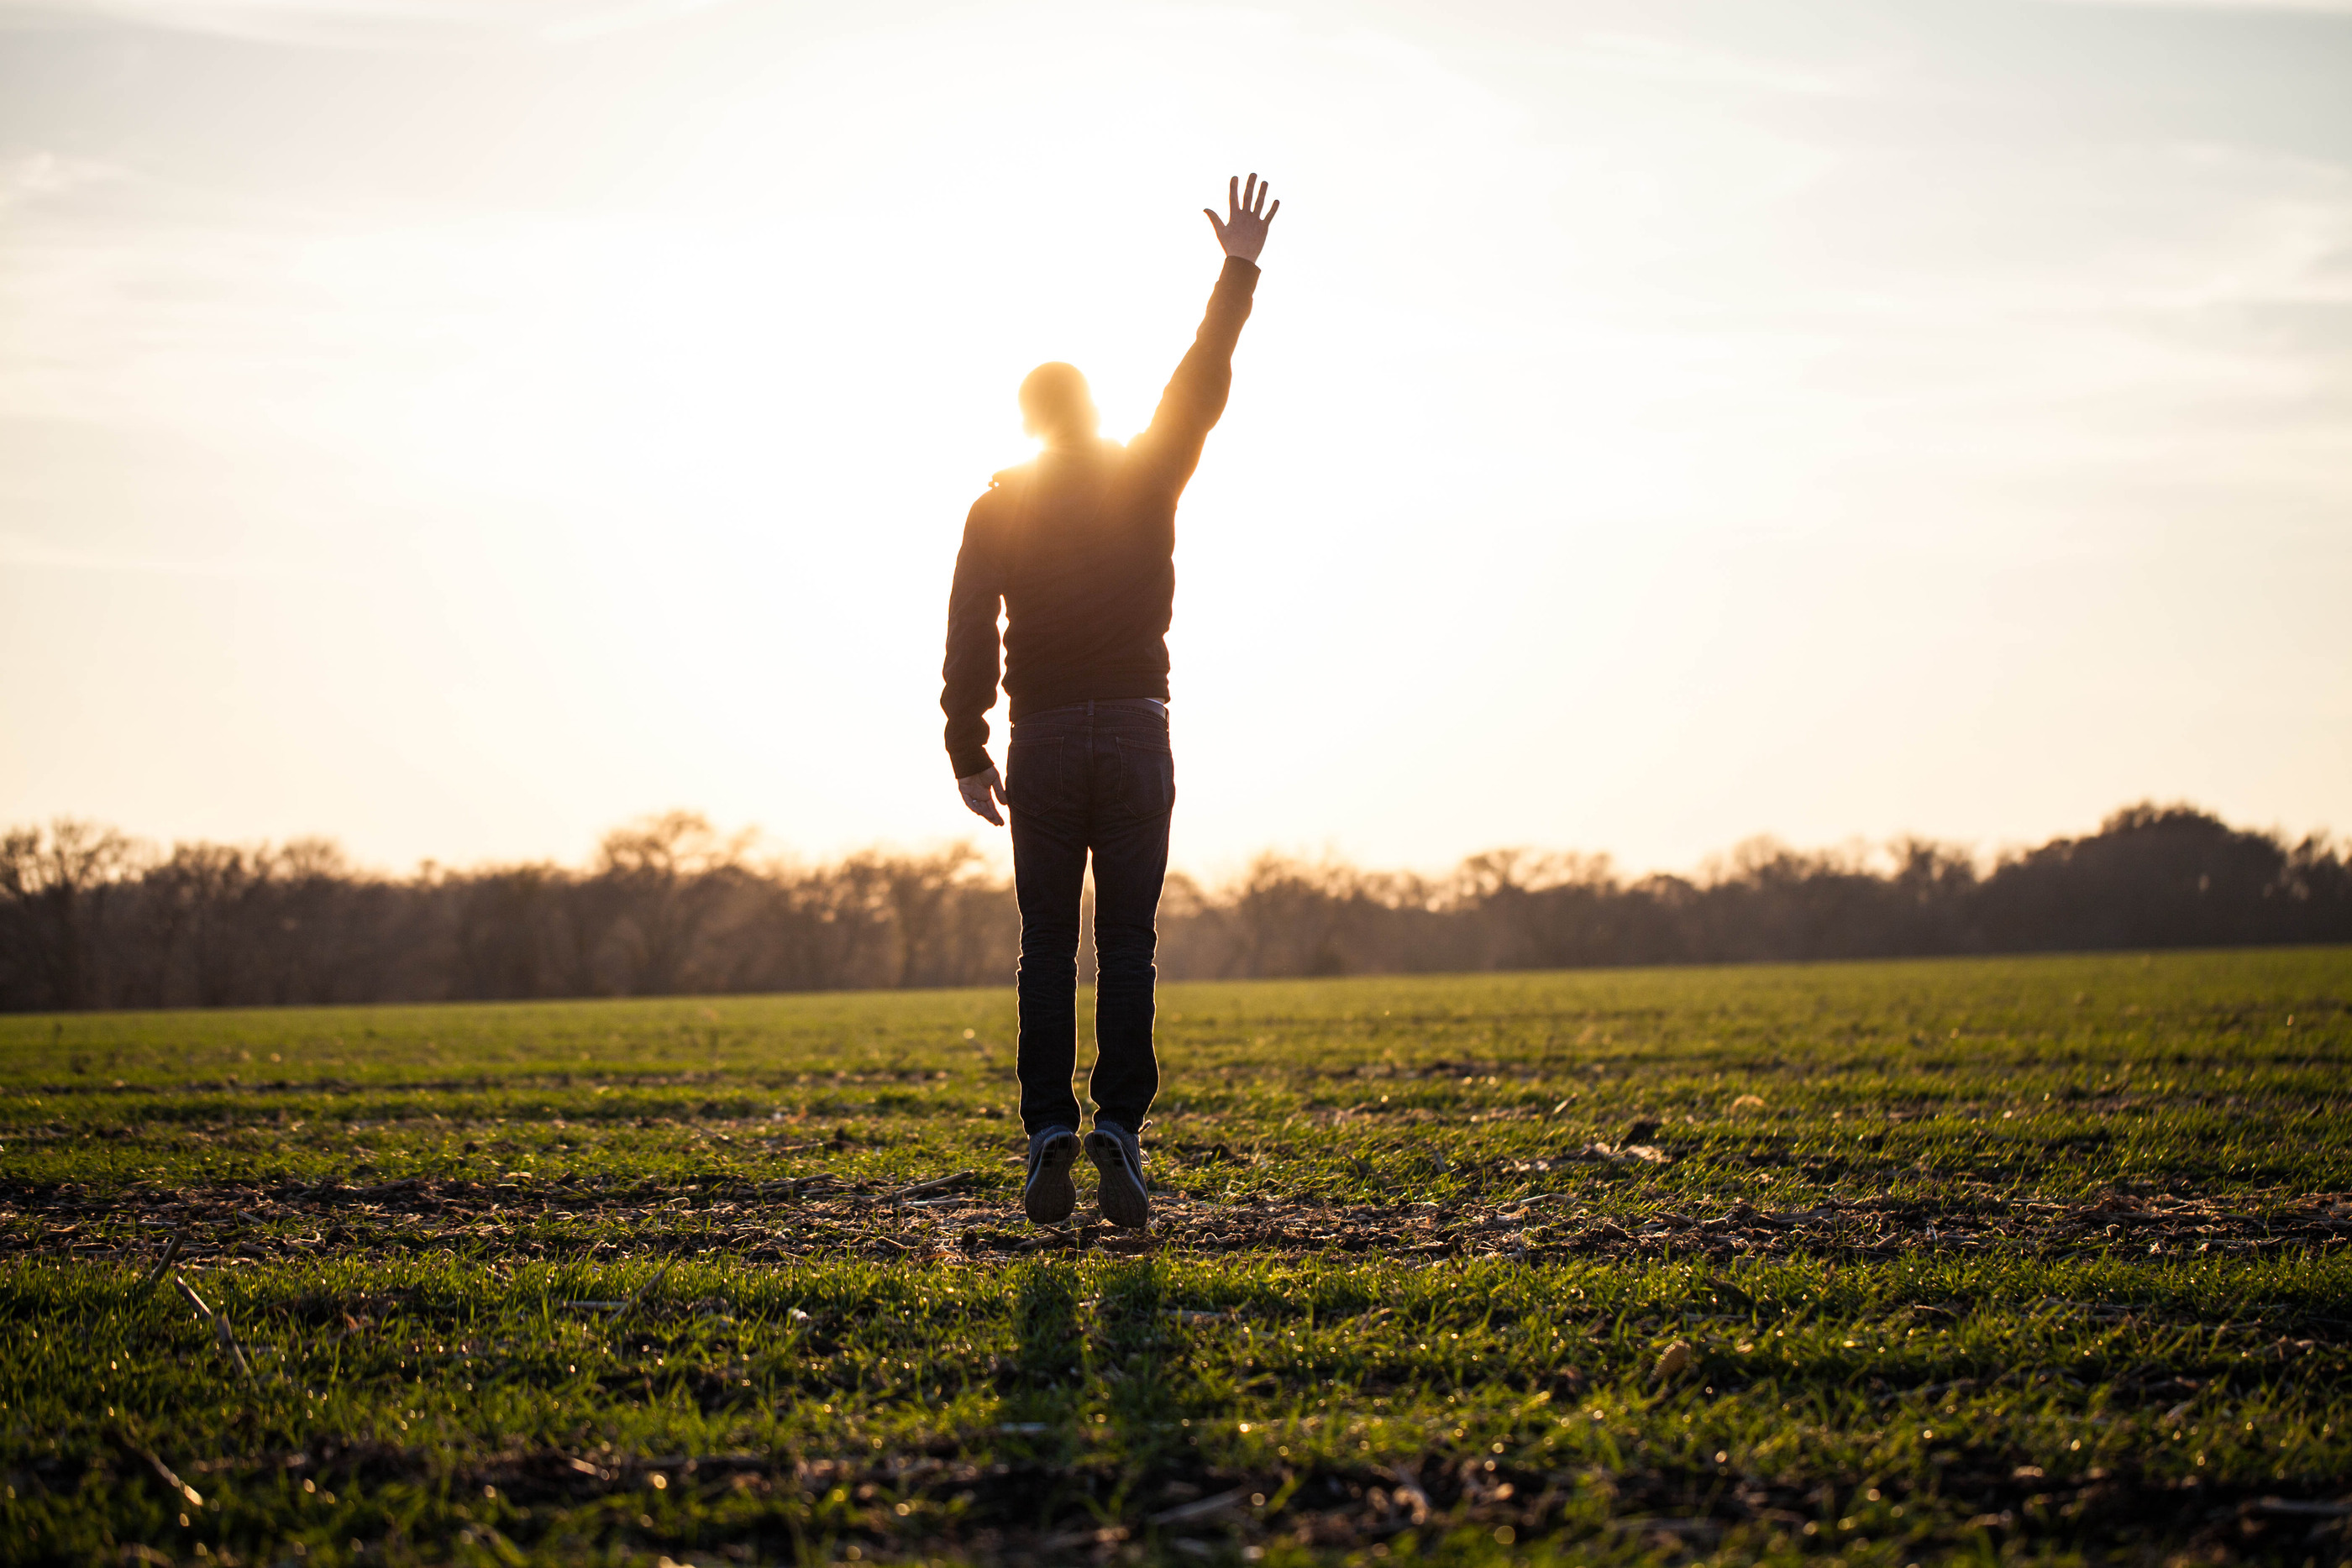 hand raised in field - lightstock_57774_medium_user_1230963